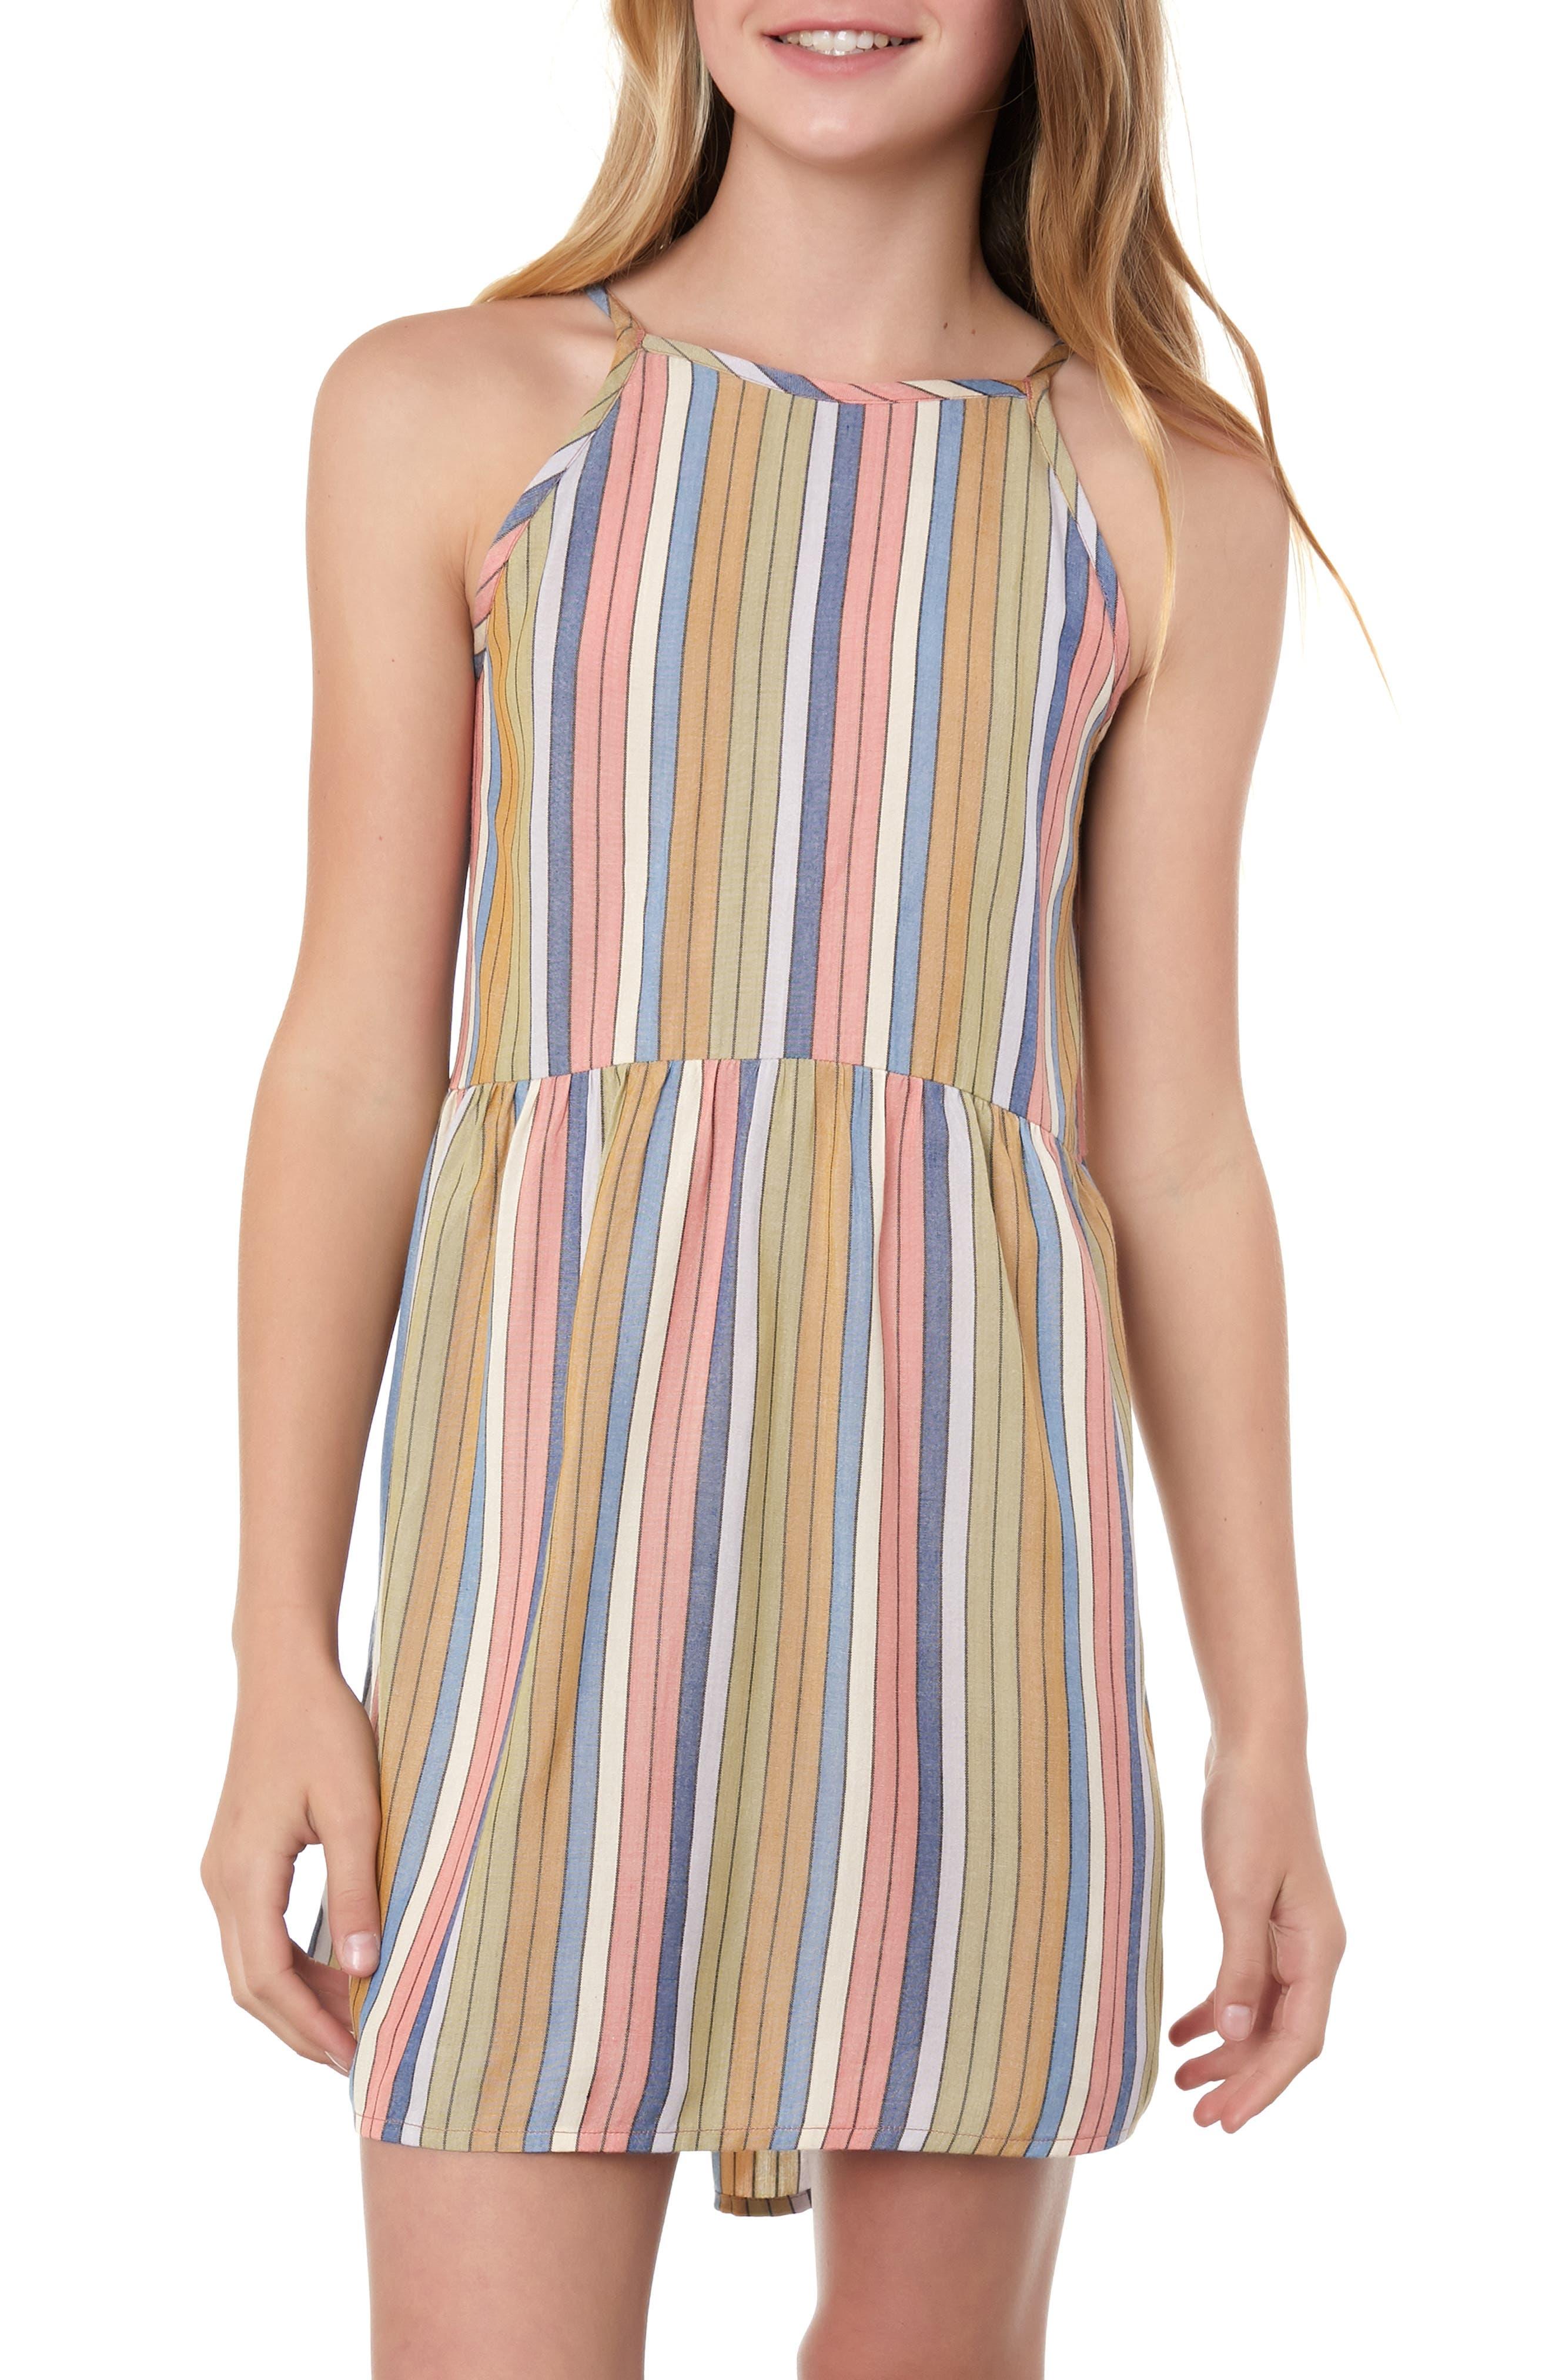 O'NEILL,                             Berlin Stripe Sundress,                             Alternate thumbnail 2, color,                             MULTI COLORED